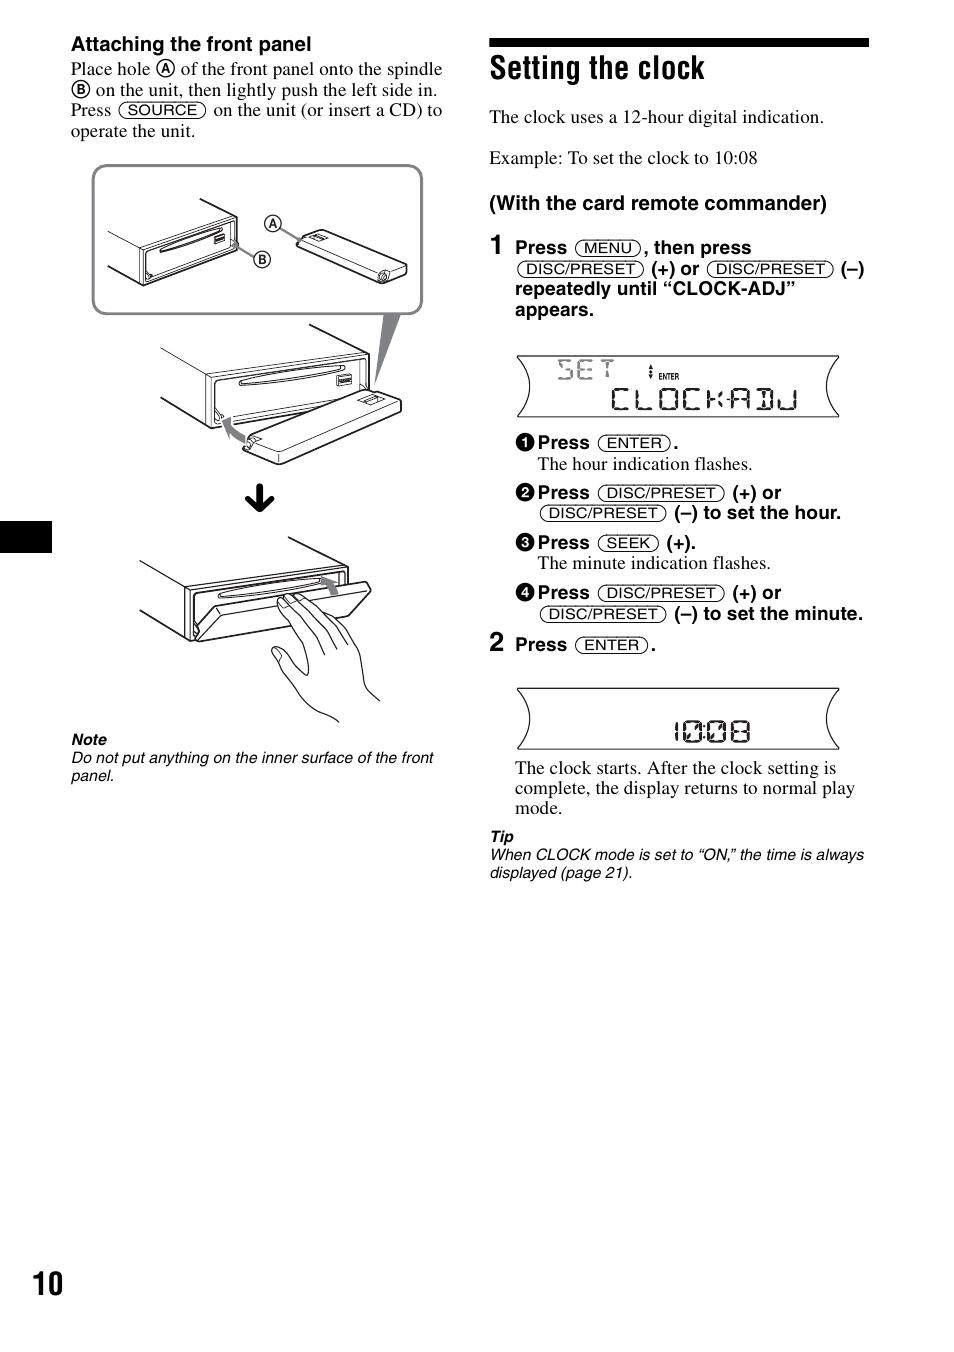 medium resolution of setting the clock sony cdx f5700 user manual page 10 92sony cdx f5700 wiring diagram